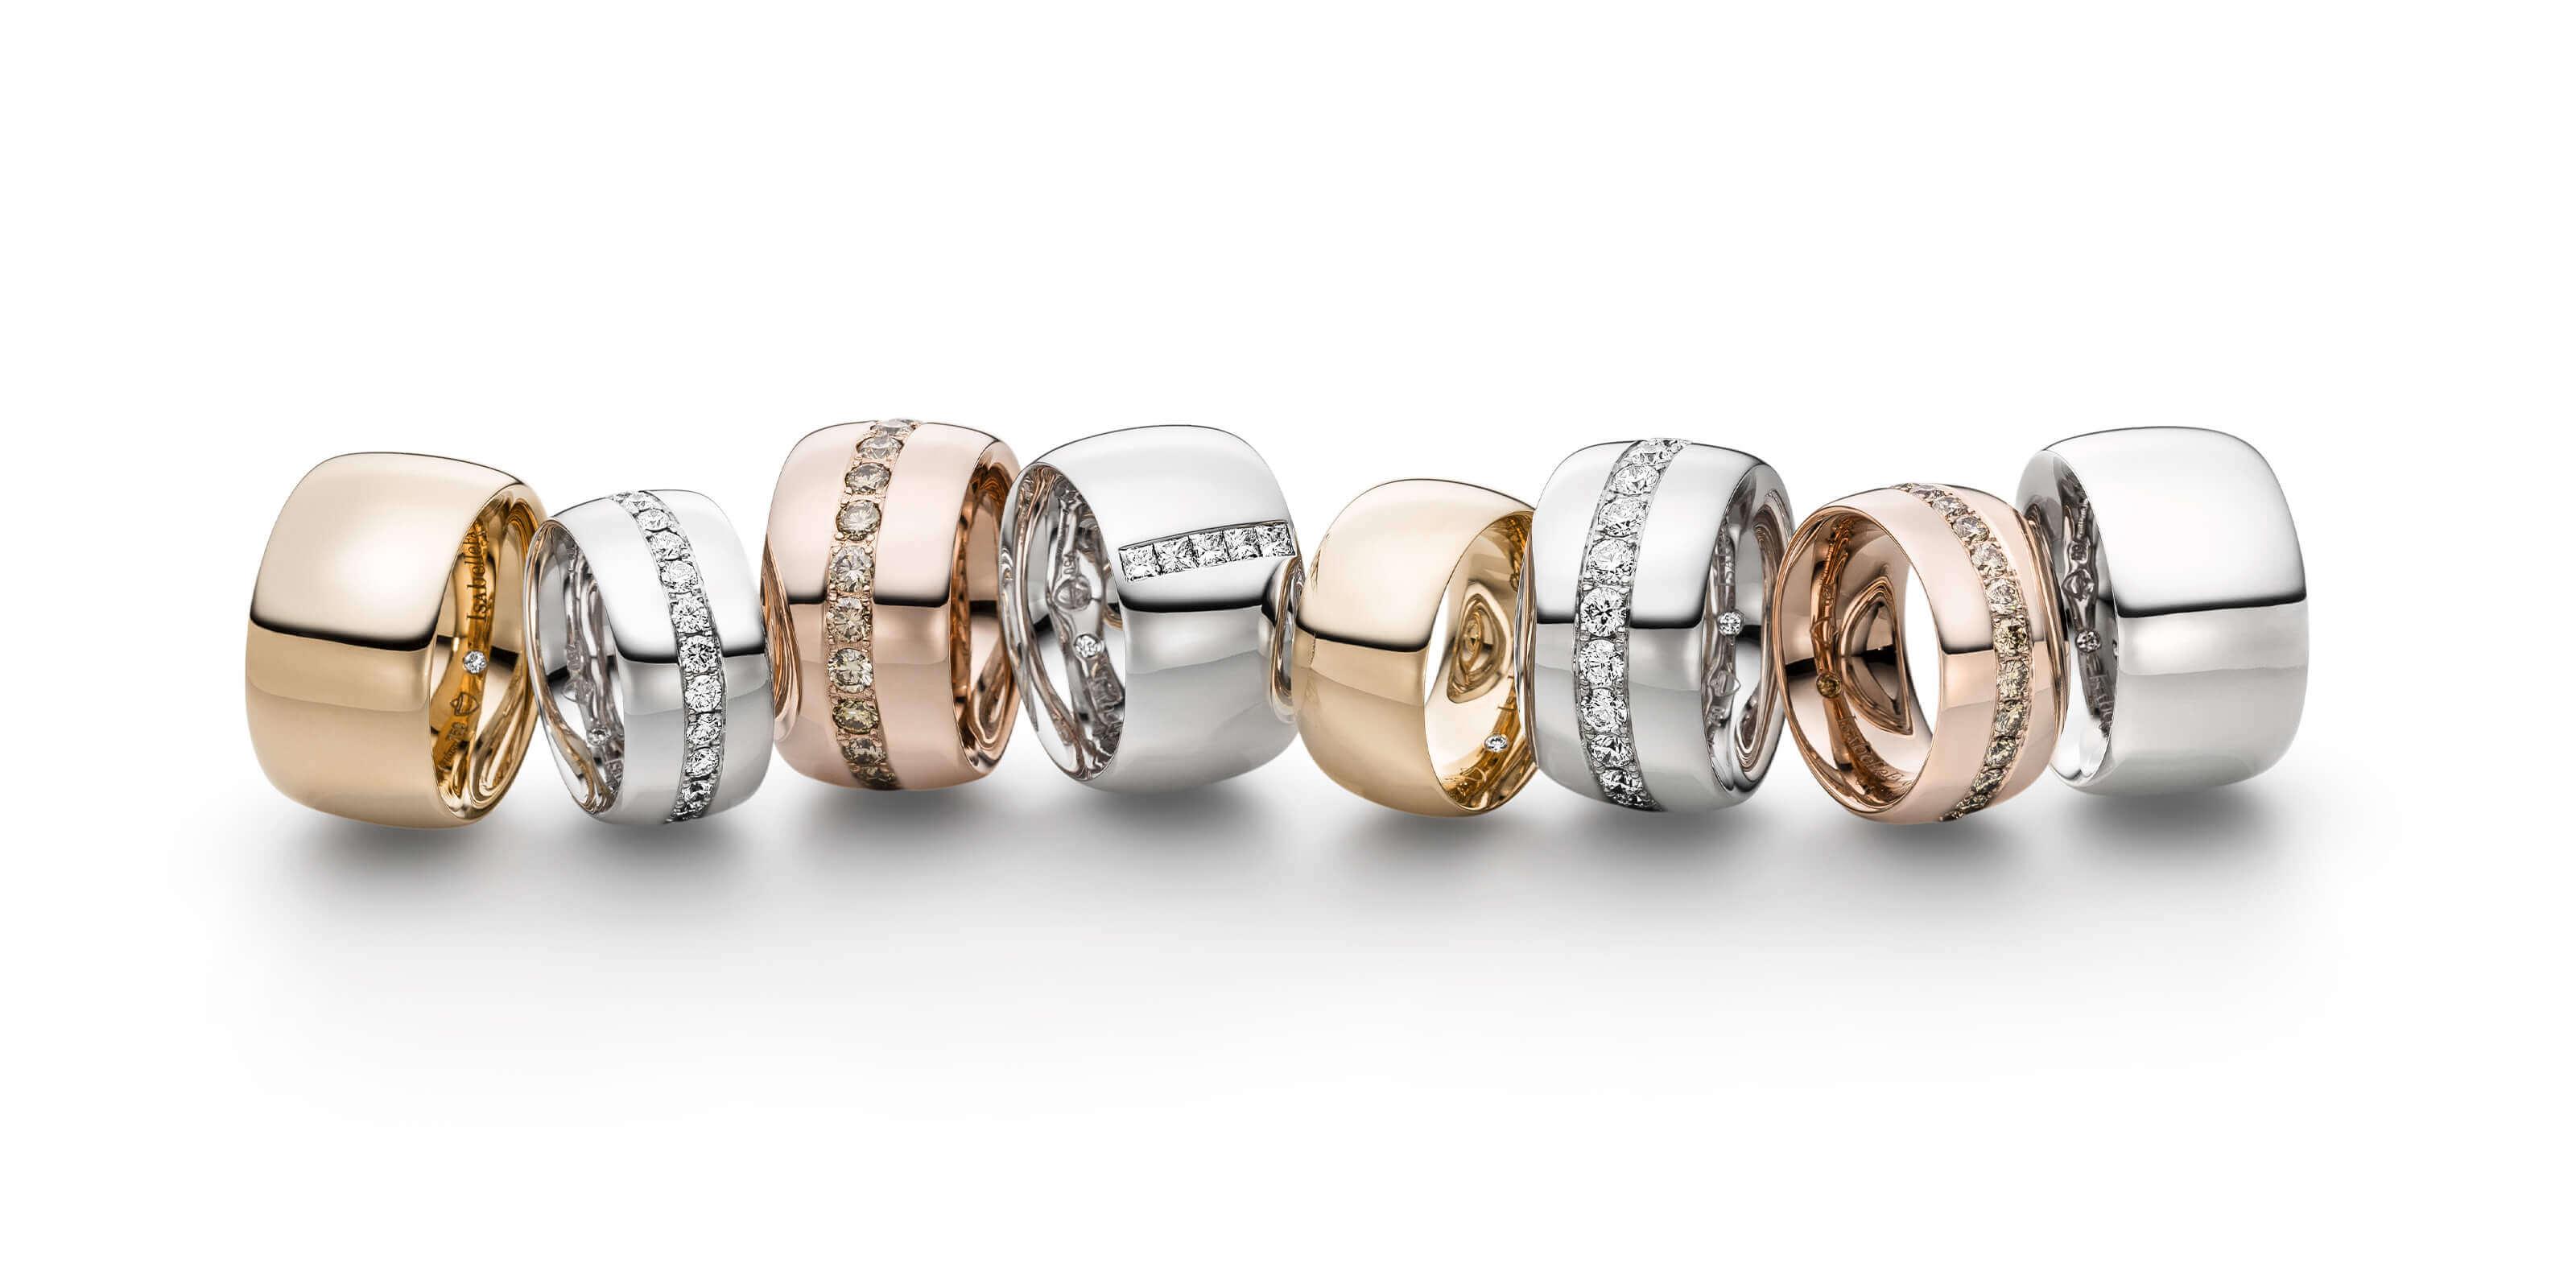 Ring Gold Navette Übersicht